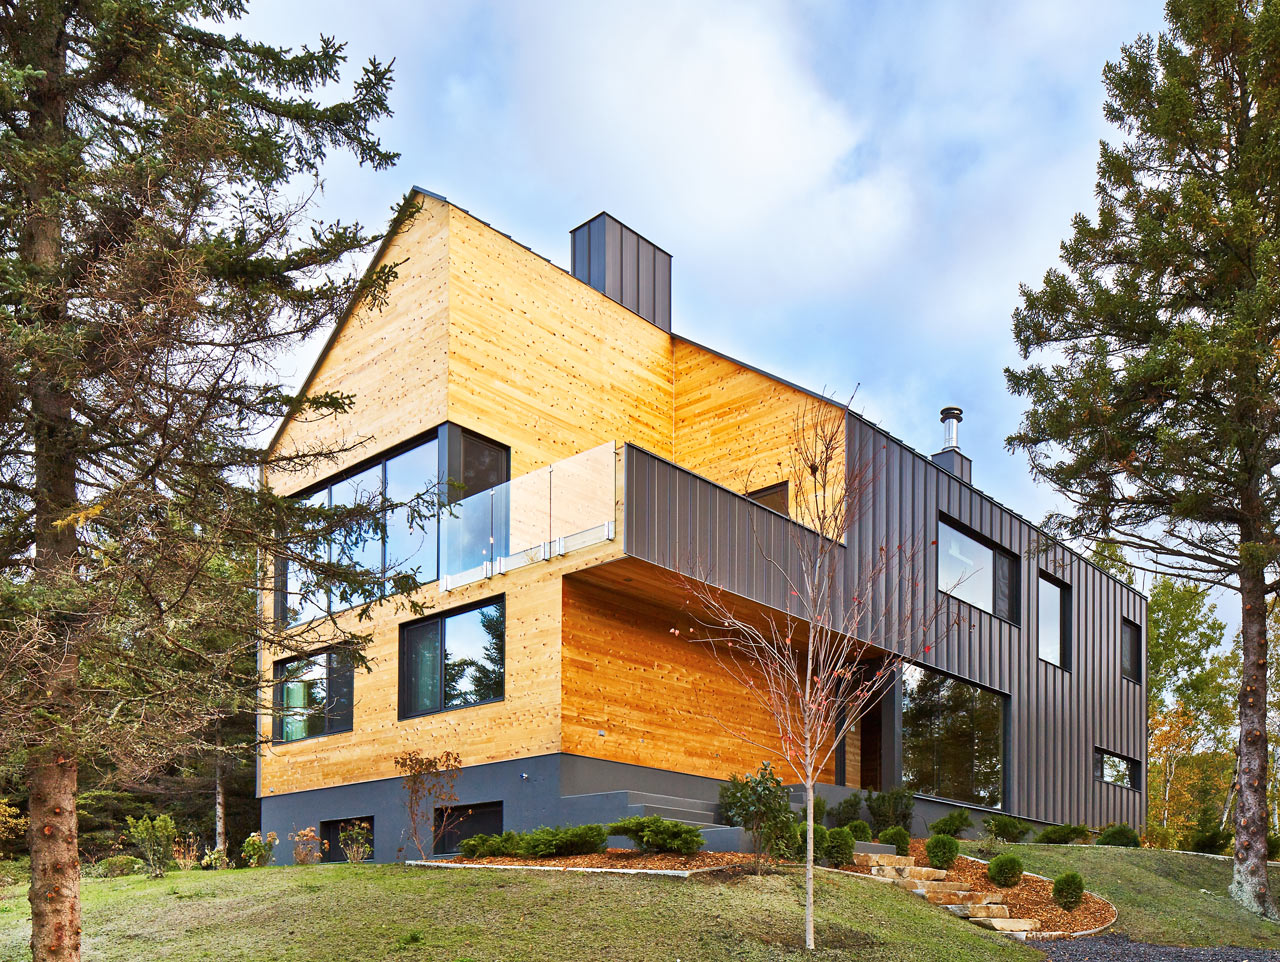 A Modern BarnLike House by MU Architecture Design Milk